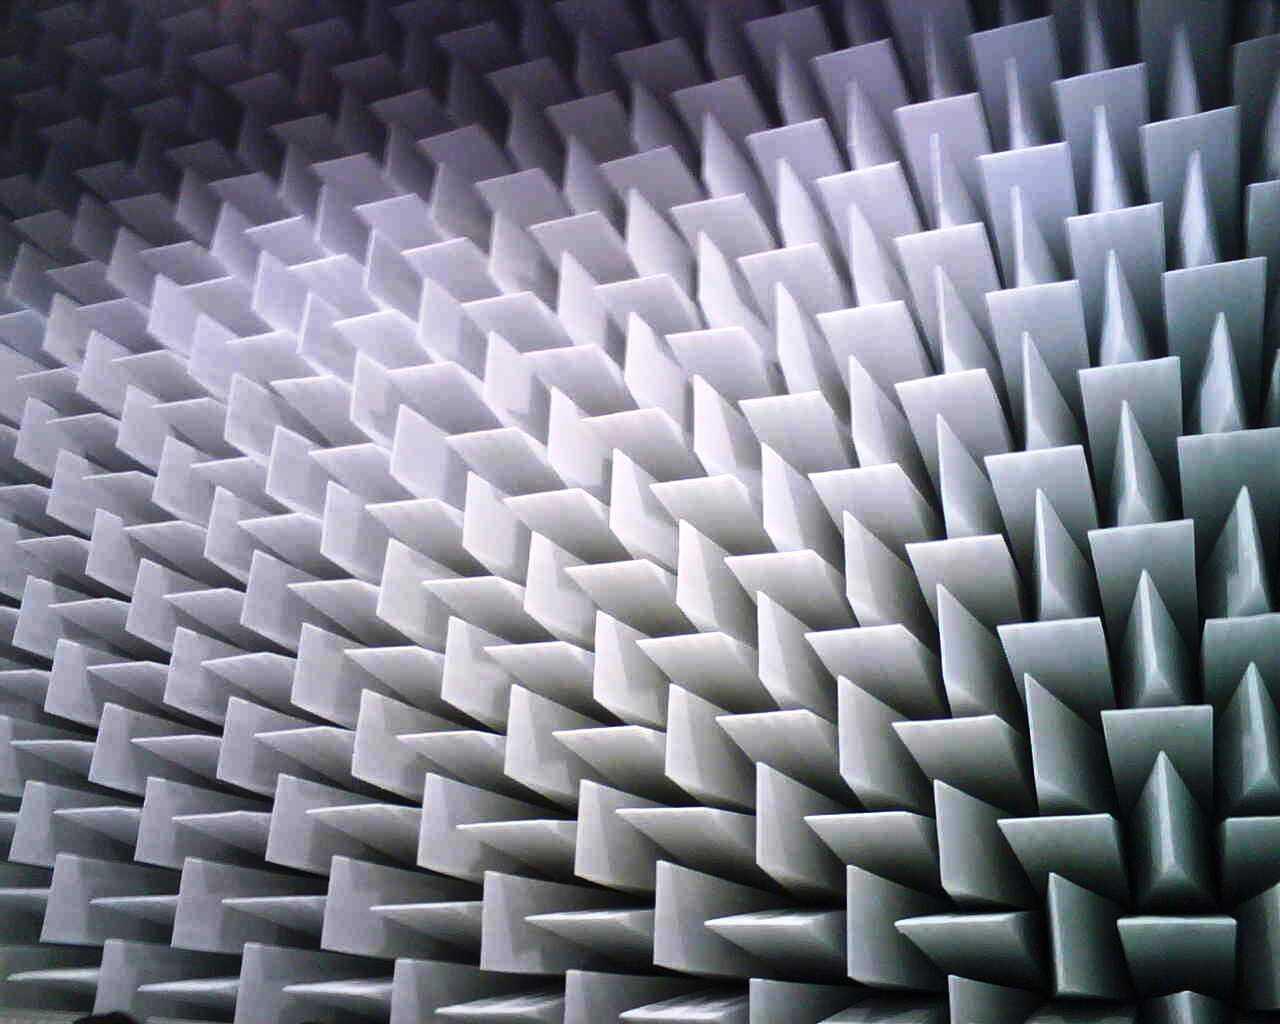 Banc de test acoustique - chambres anechoïques (full - semi)